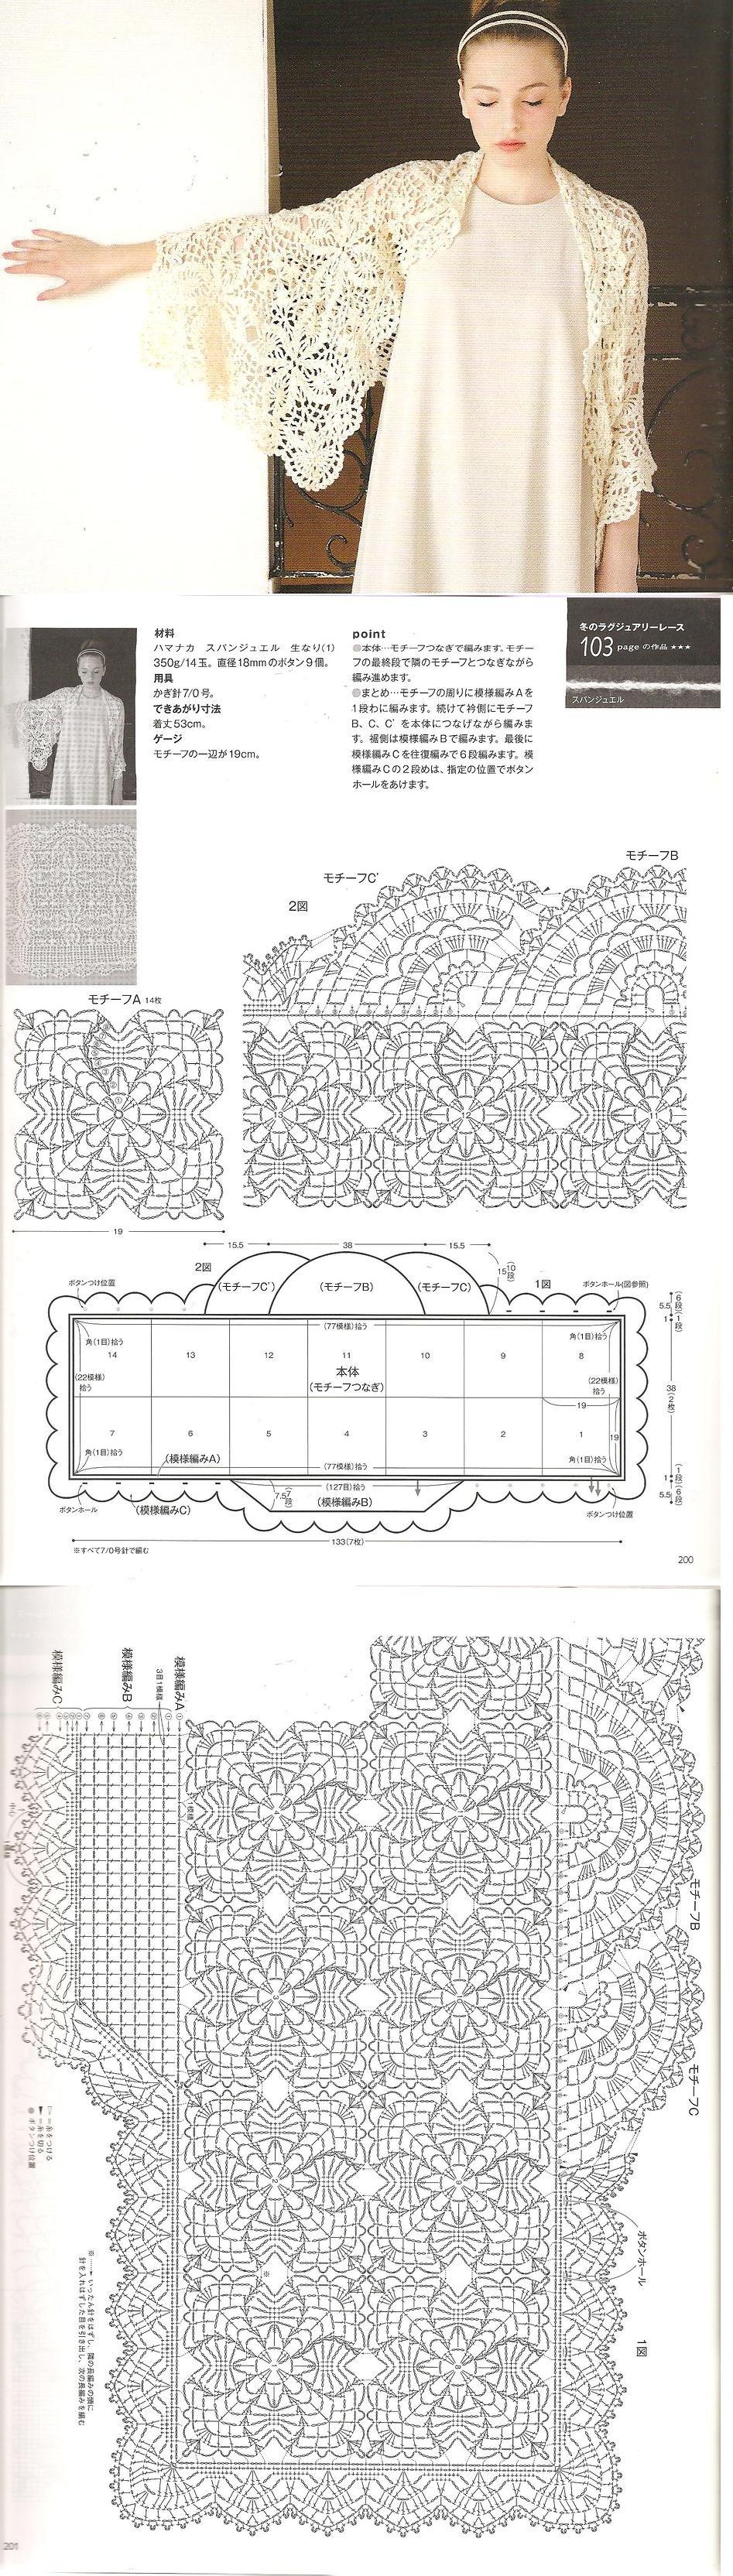 Pin de Miriam Maria Bianchi en Graficos crochet | Pinterest | Tops ...